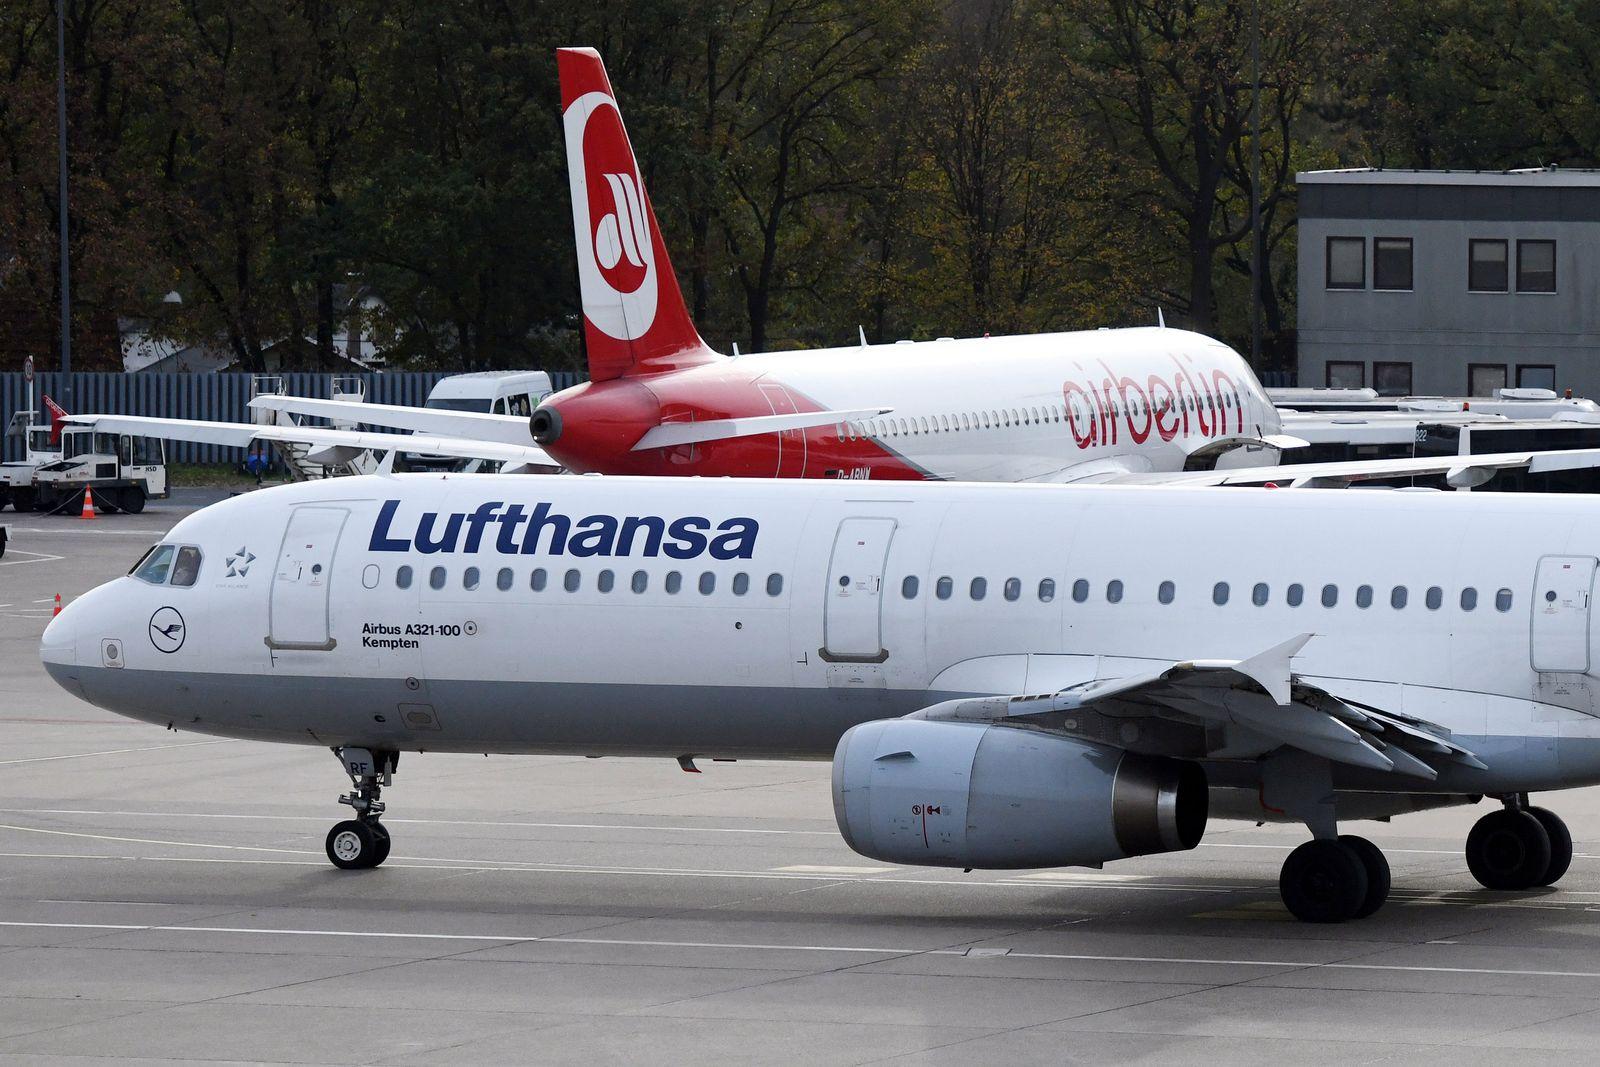 Lufthansa Air Berlin